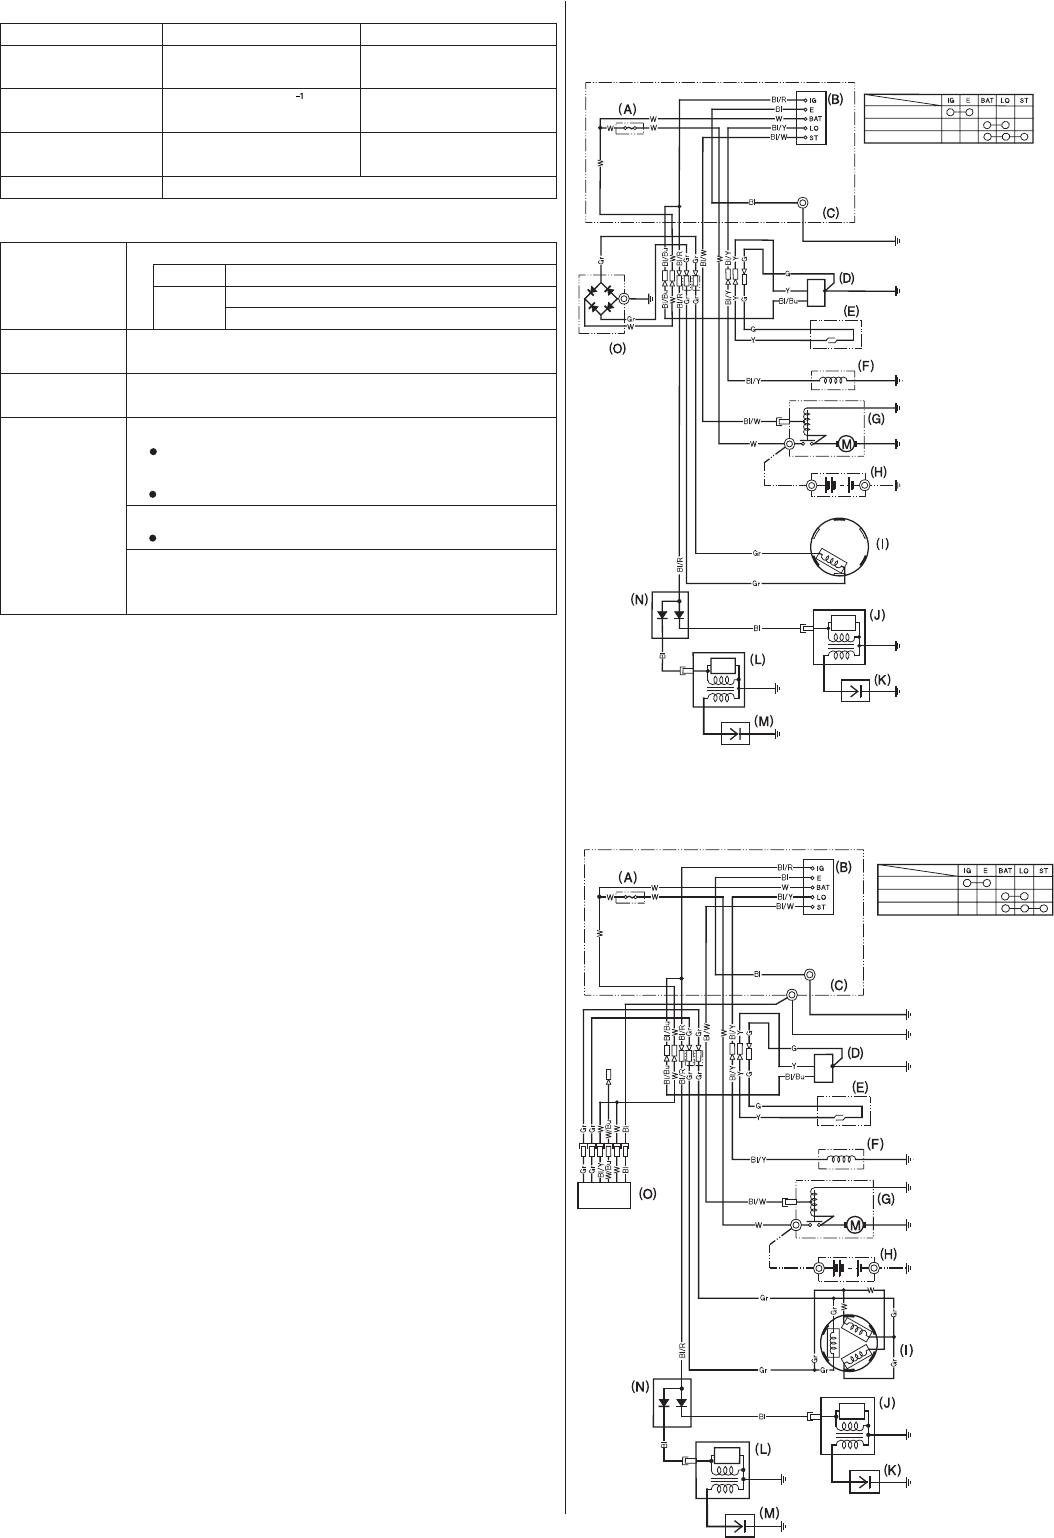 Honda Gx670 Owners Manual Wiring Diagram 35z6c600 017